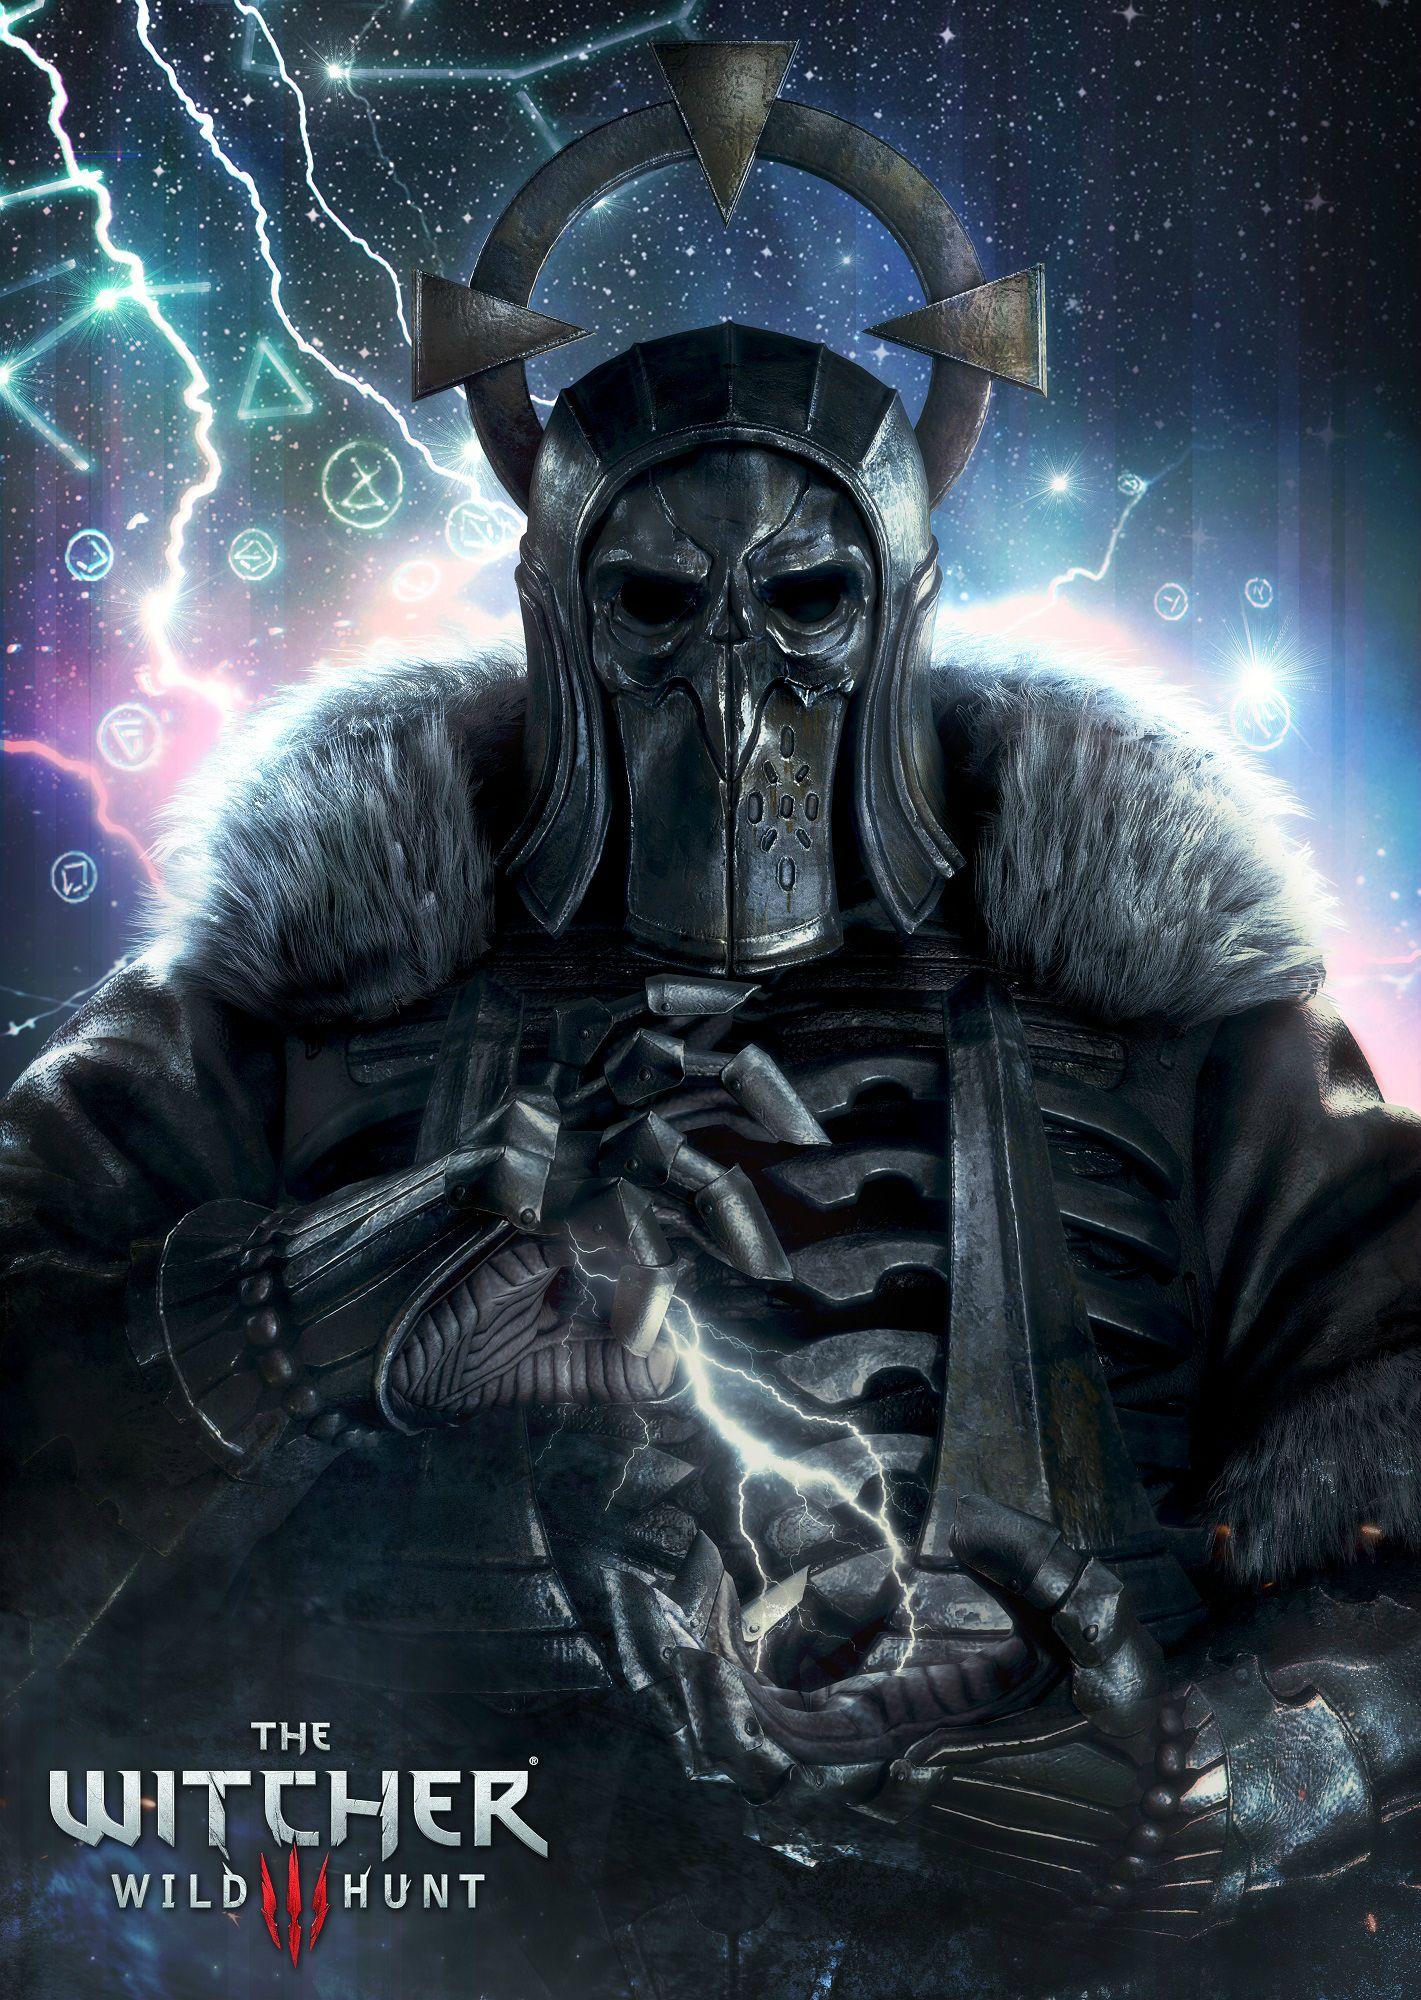 Ciri and caranthir vs rey and kylo ren spacebattles forums - Caranthir witcher ...